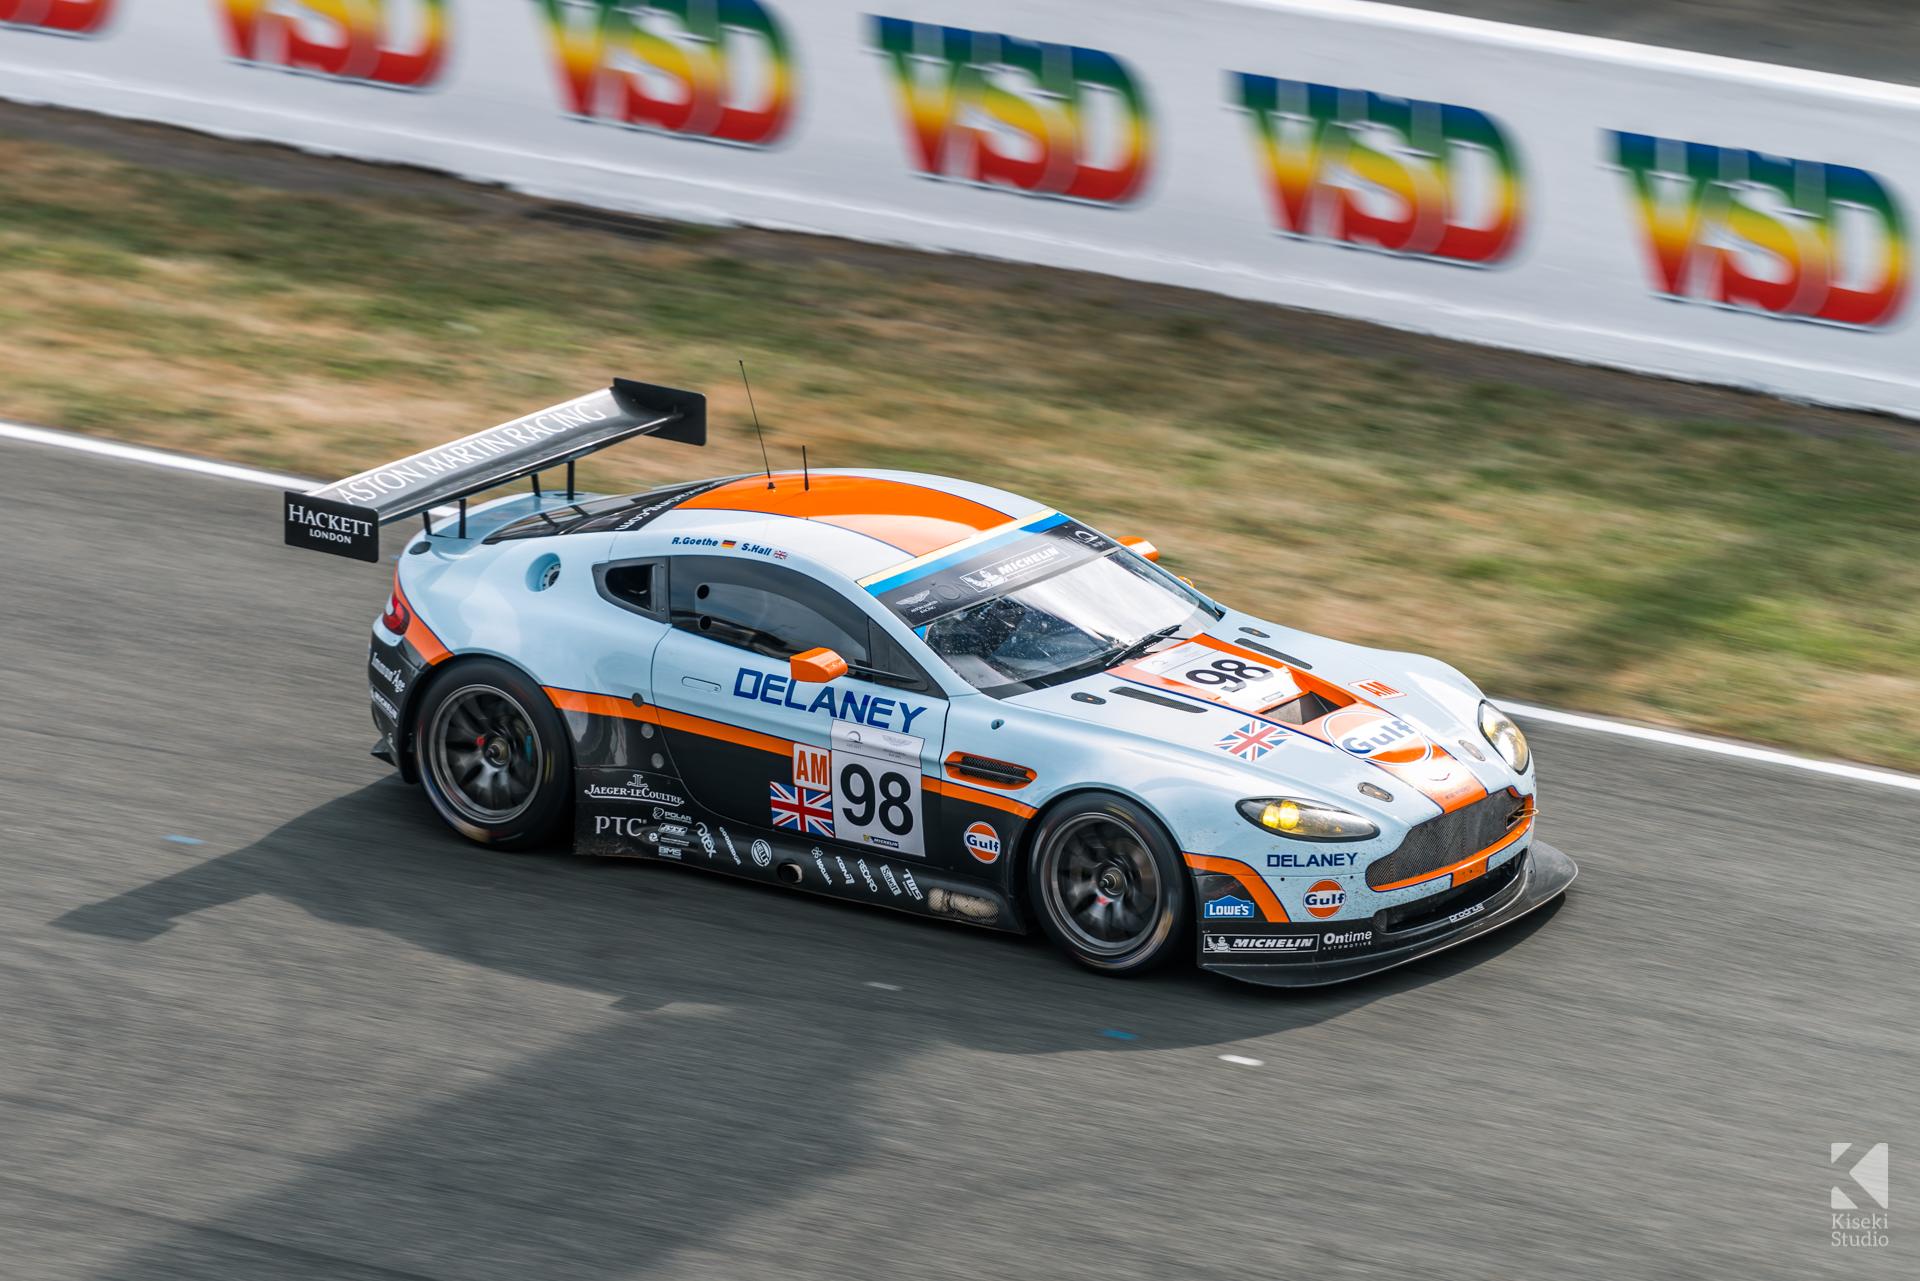 24 Hours Le Mans - Aston Martin V8 Vantage